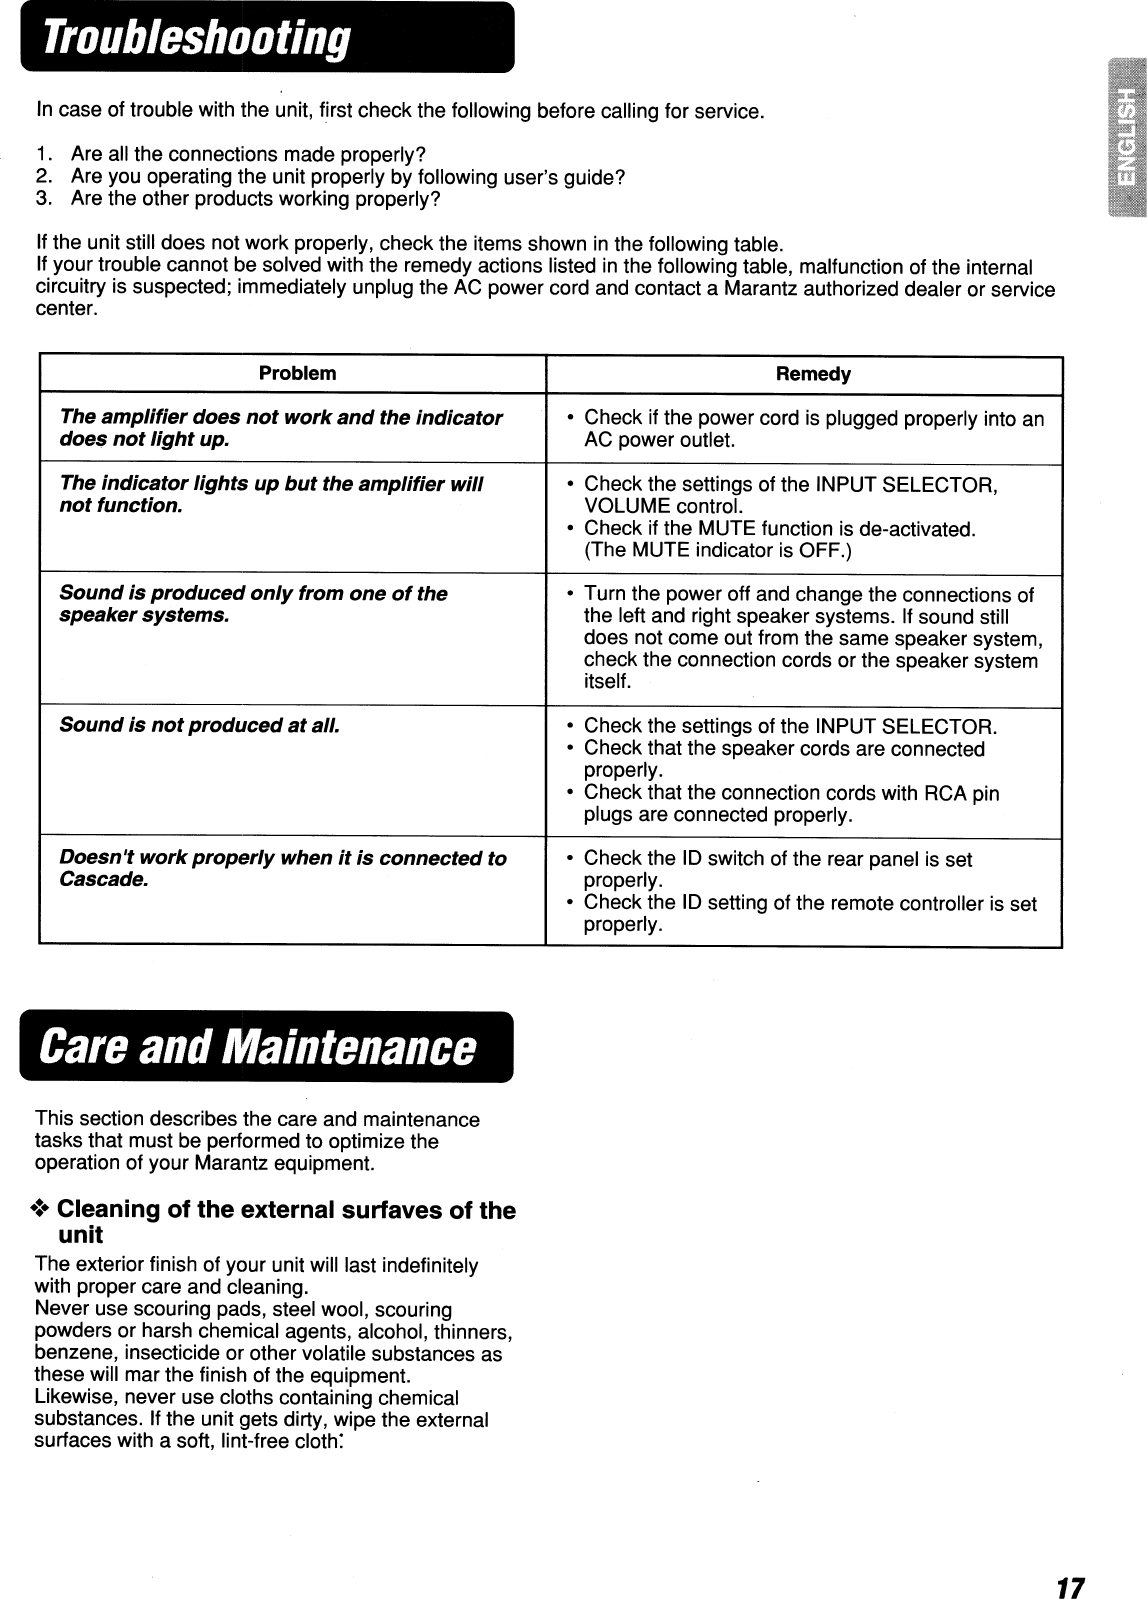 Marantz Zs5300 Users Manual 642ZS5300